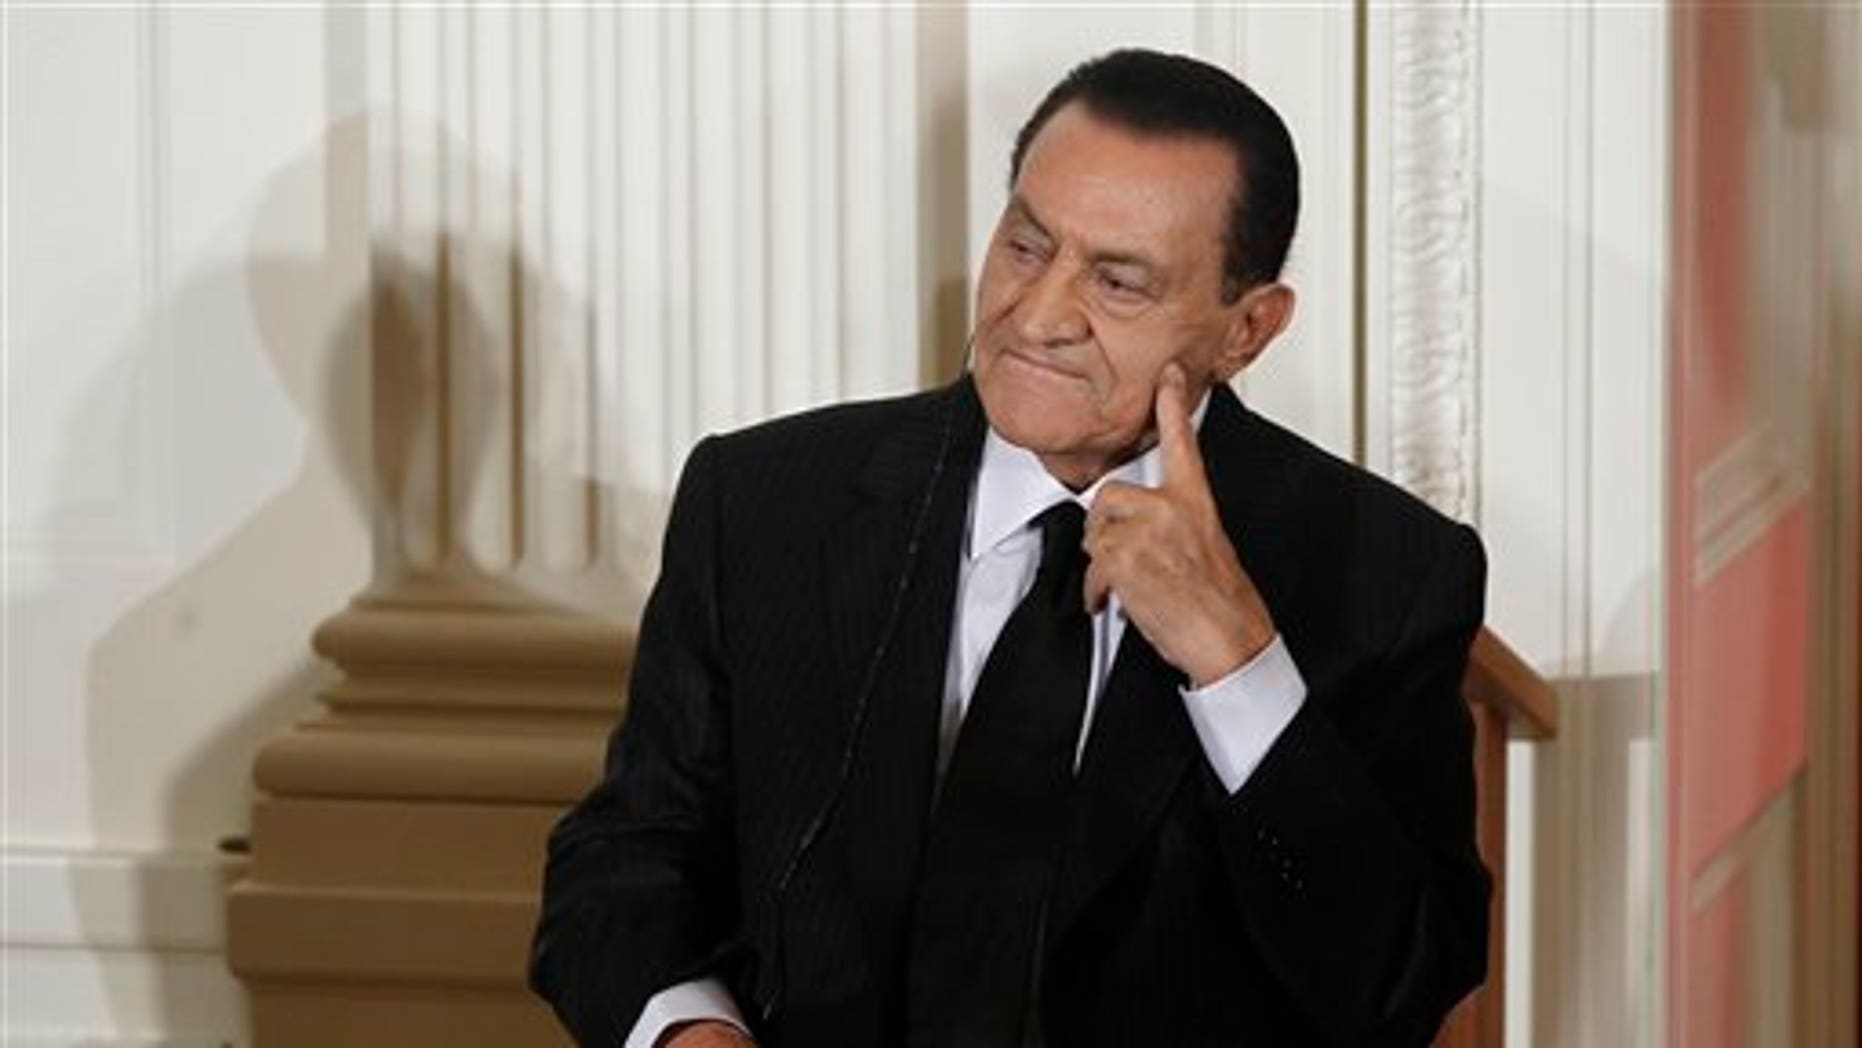 In this Sept. 2010 file photo, Egypt's President Hosni Mubarak listens as Israel's Prime Minister Benjamin Nethanyahu, unseen, speaks in the East Room of the White House in Washington.